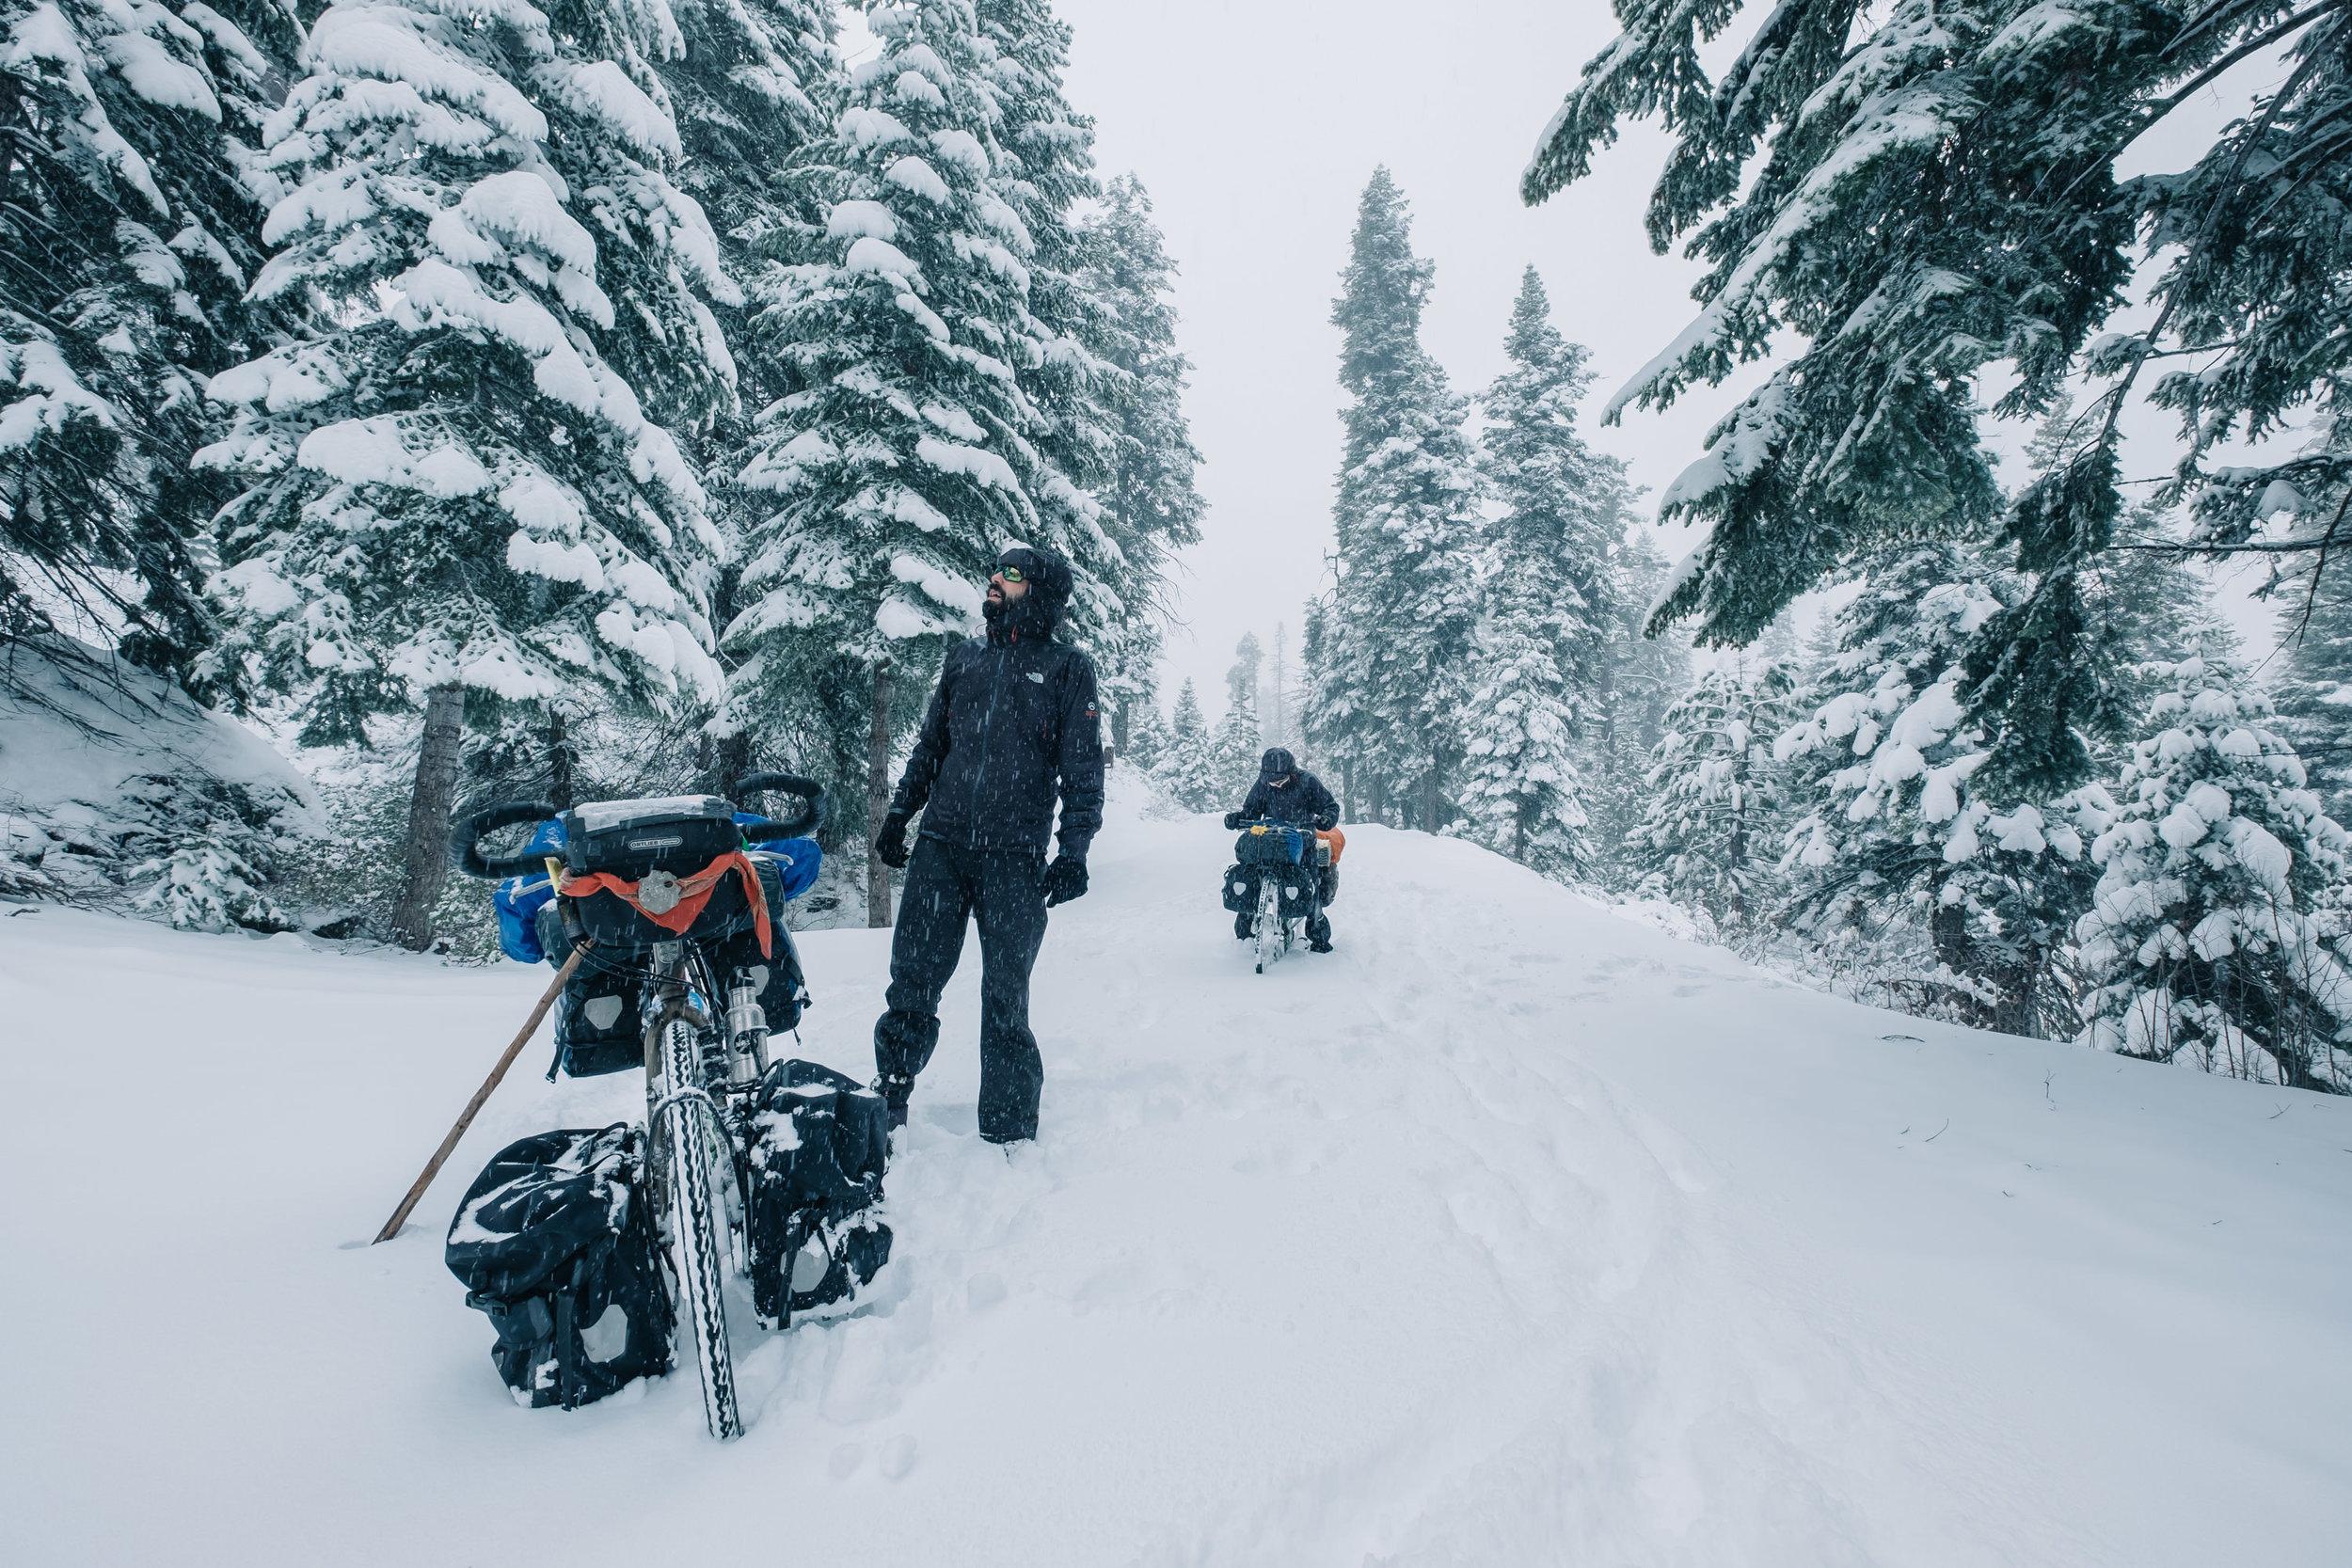 Horizonte Norte. El viaje de Juan Sisto desde Chile a Alaska en bicicleta. Kings Canyona, California 2014